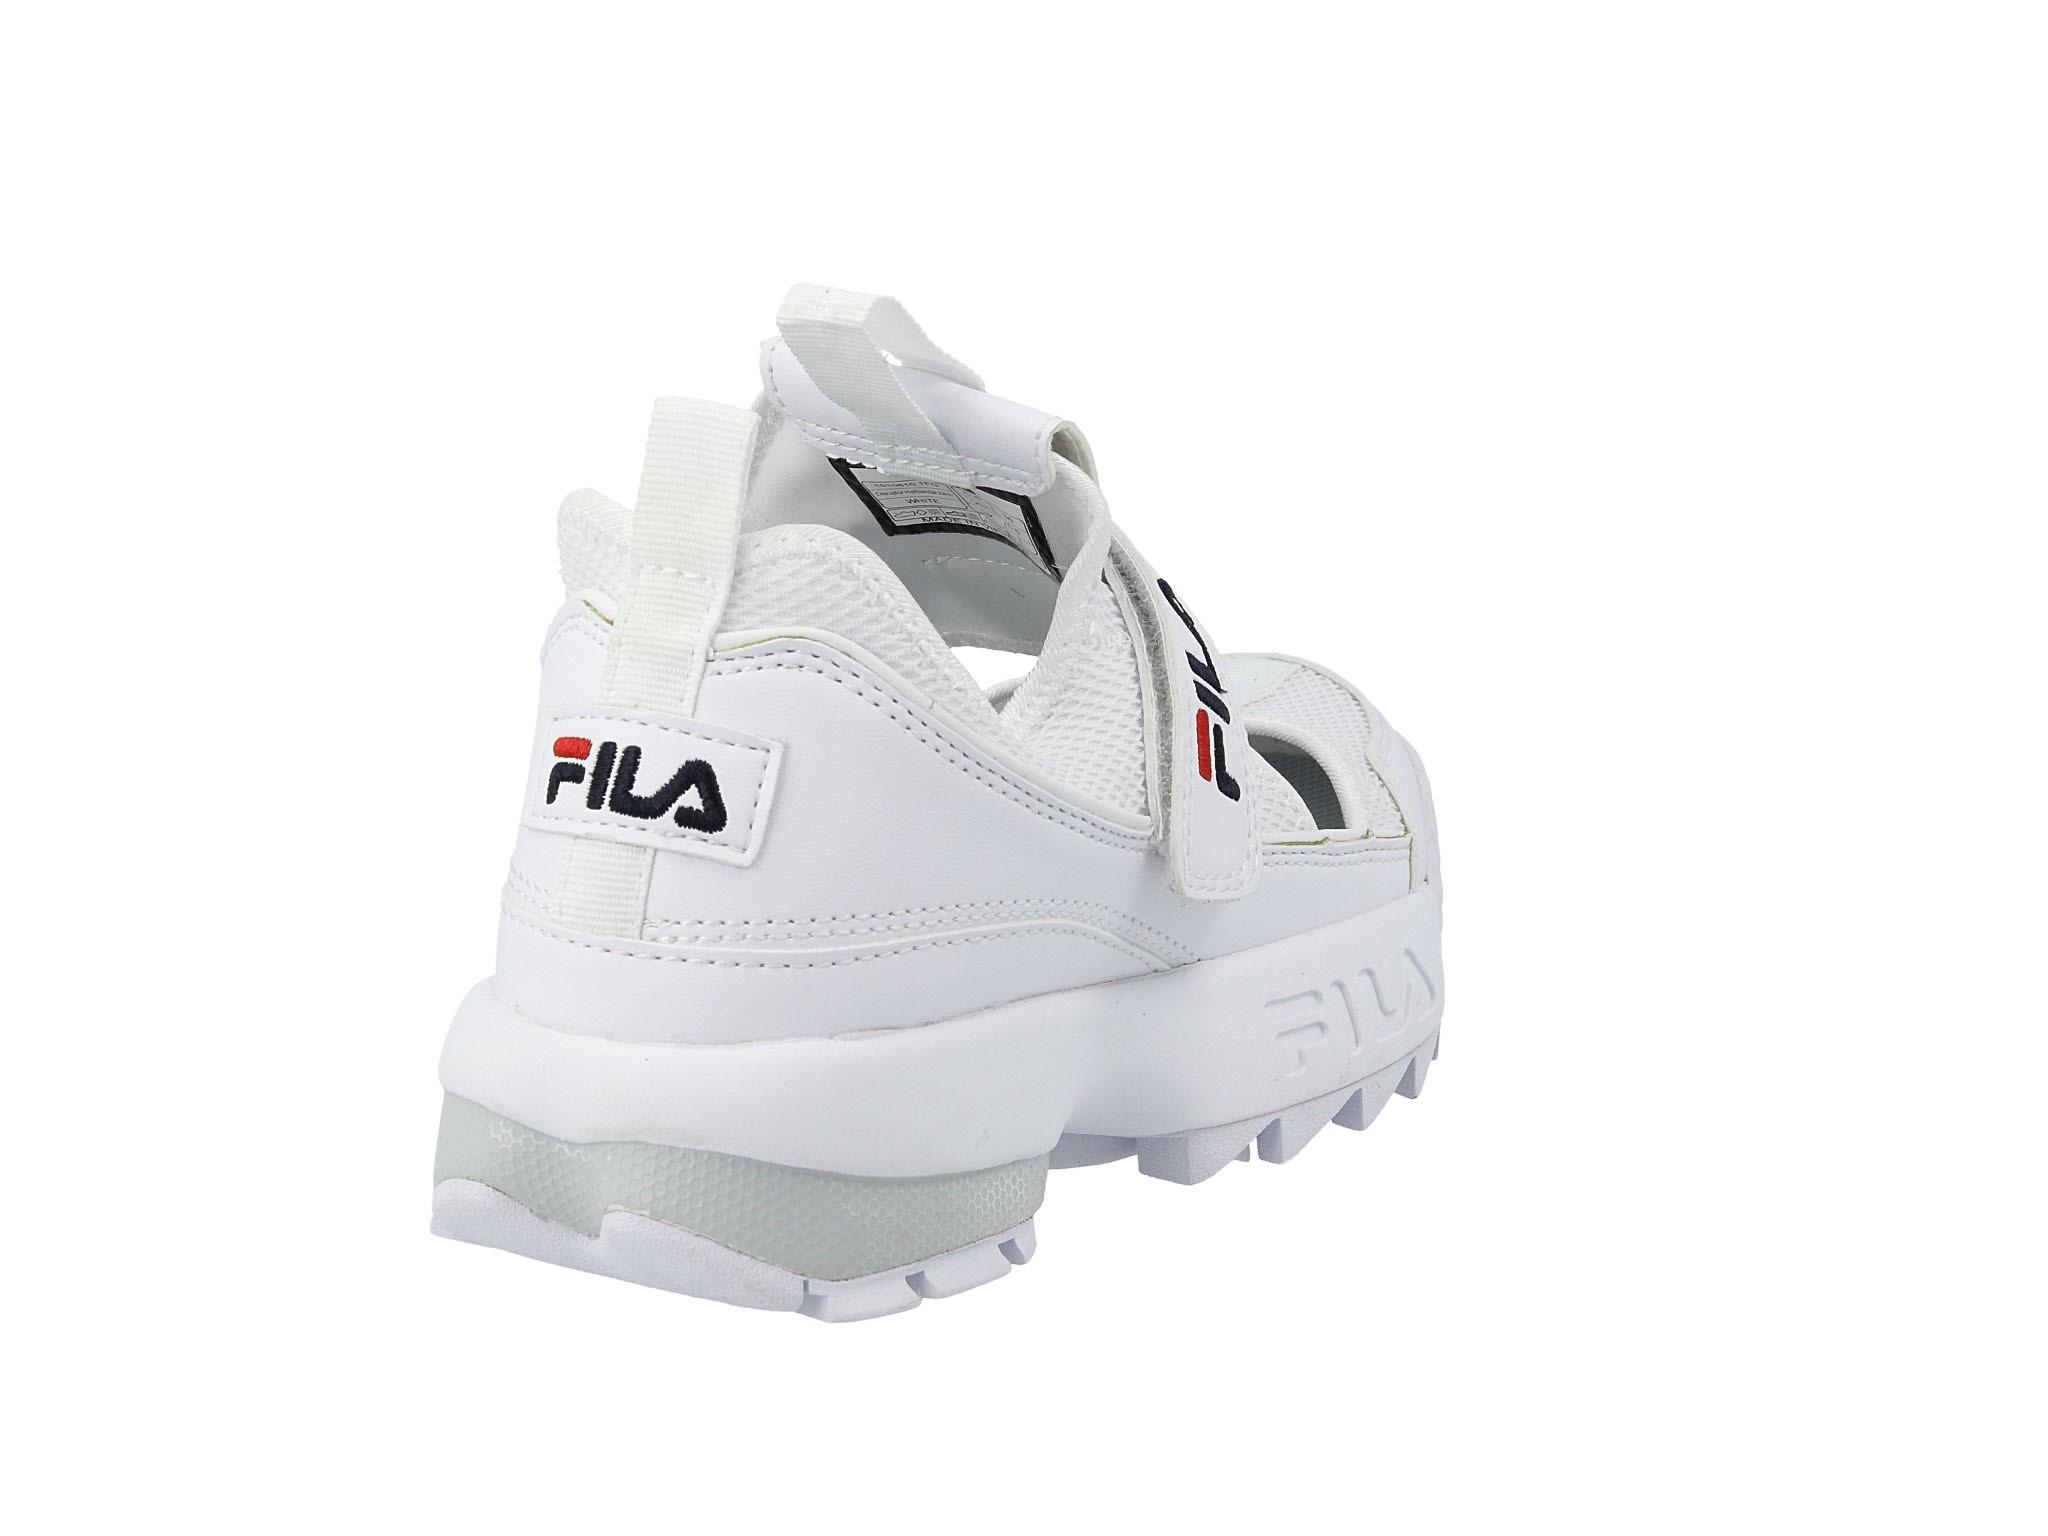 Półbuty FILA Disruptor Halfsandal Wmn 1010610.1FG White